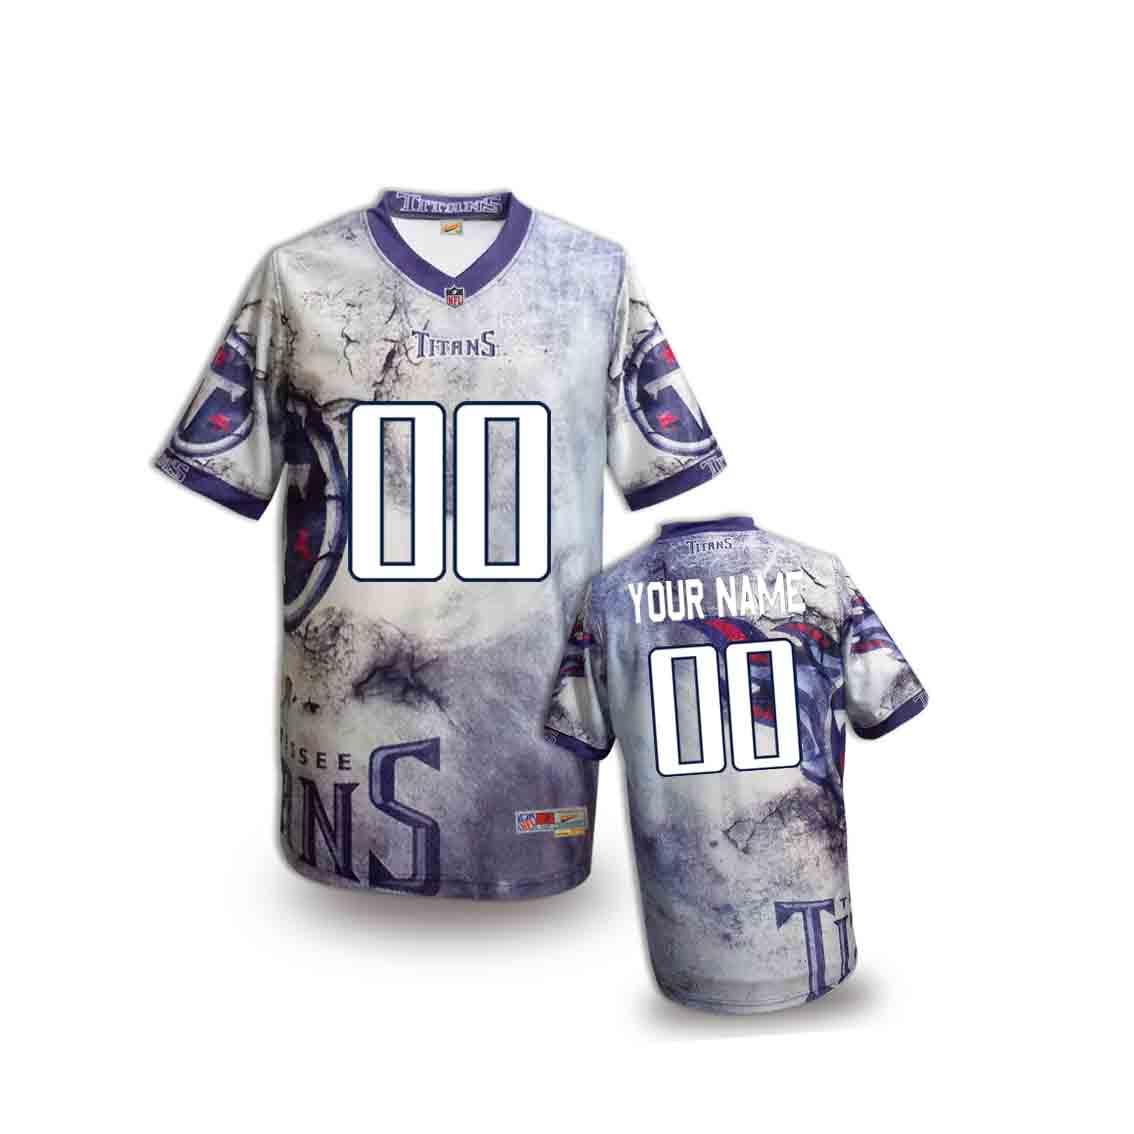 Nike Titans Customized Fashion Stitched Youth Jerseys03